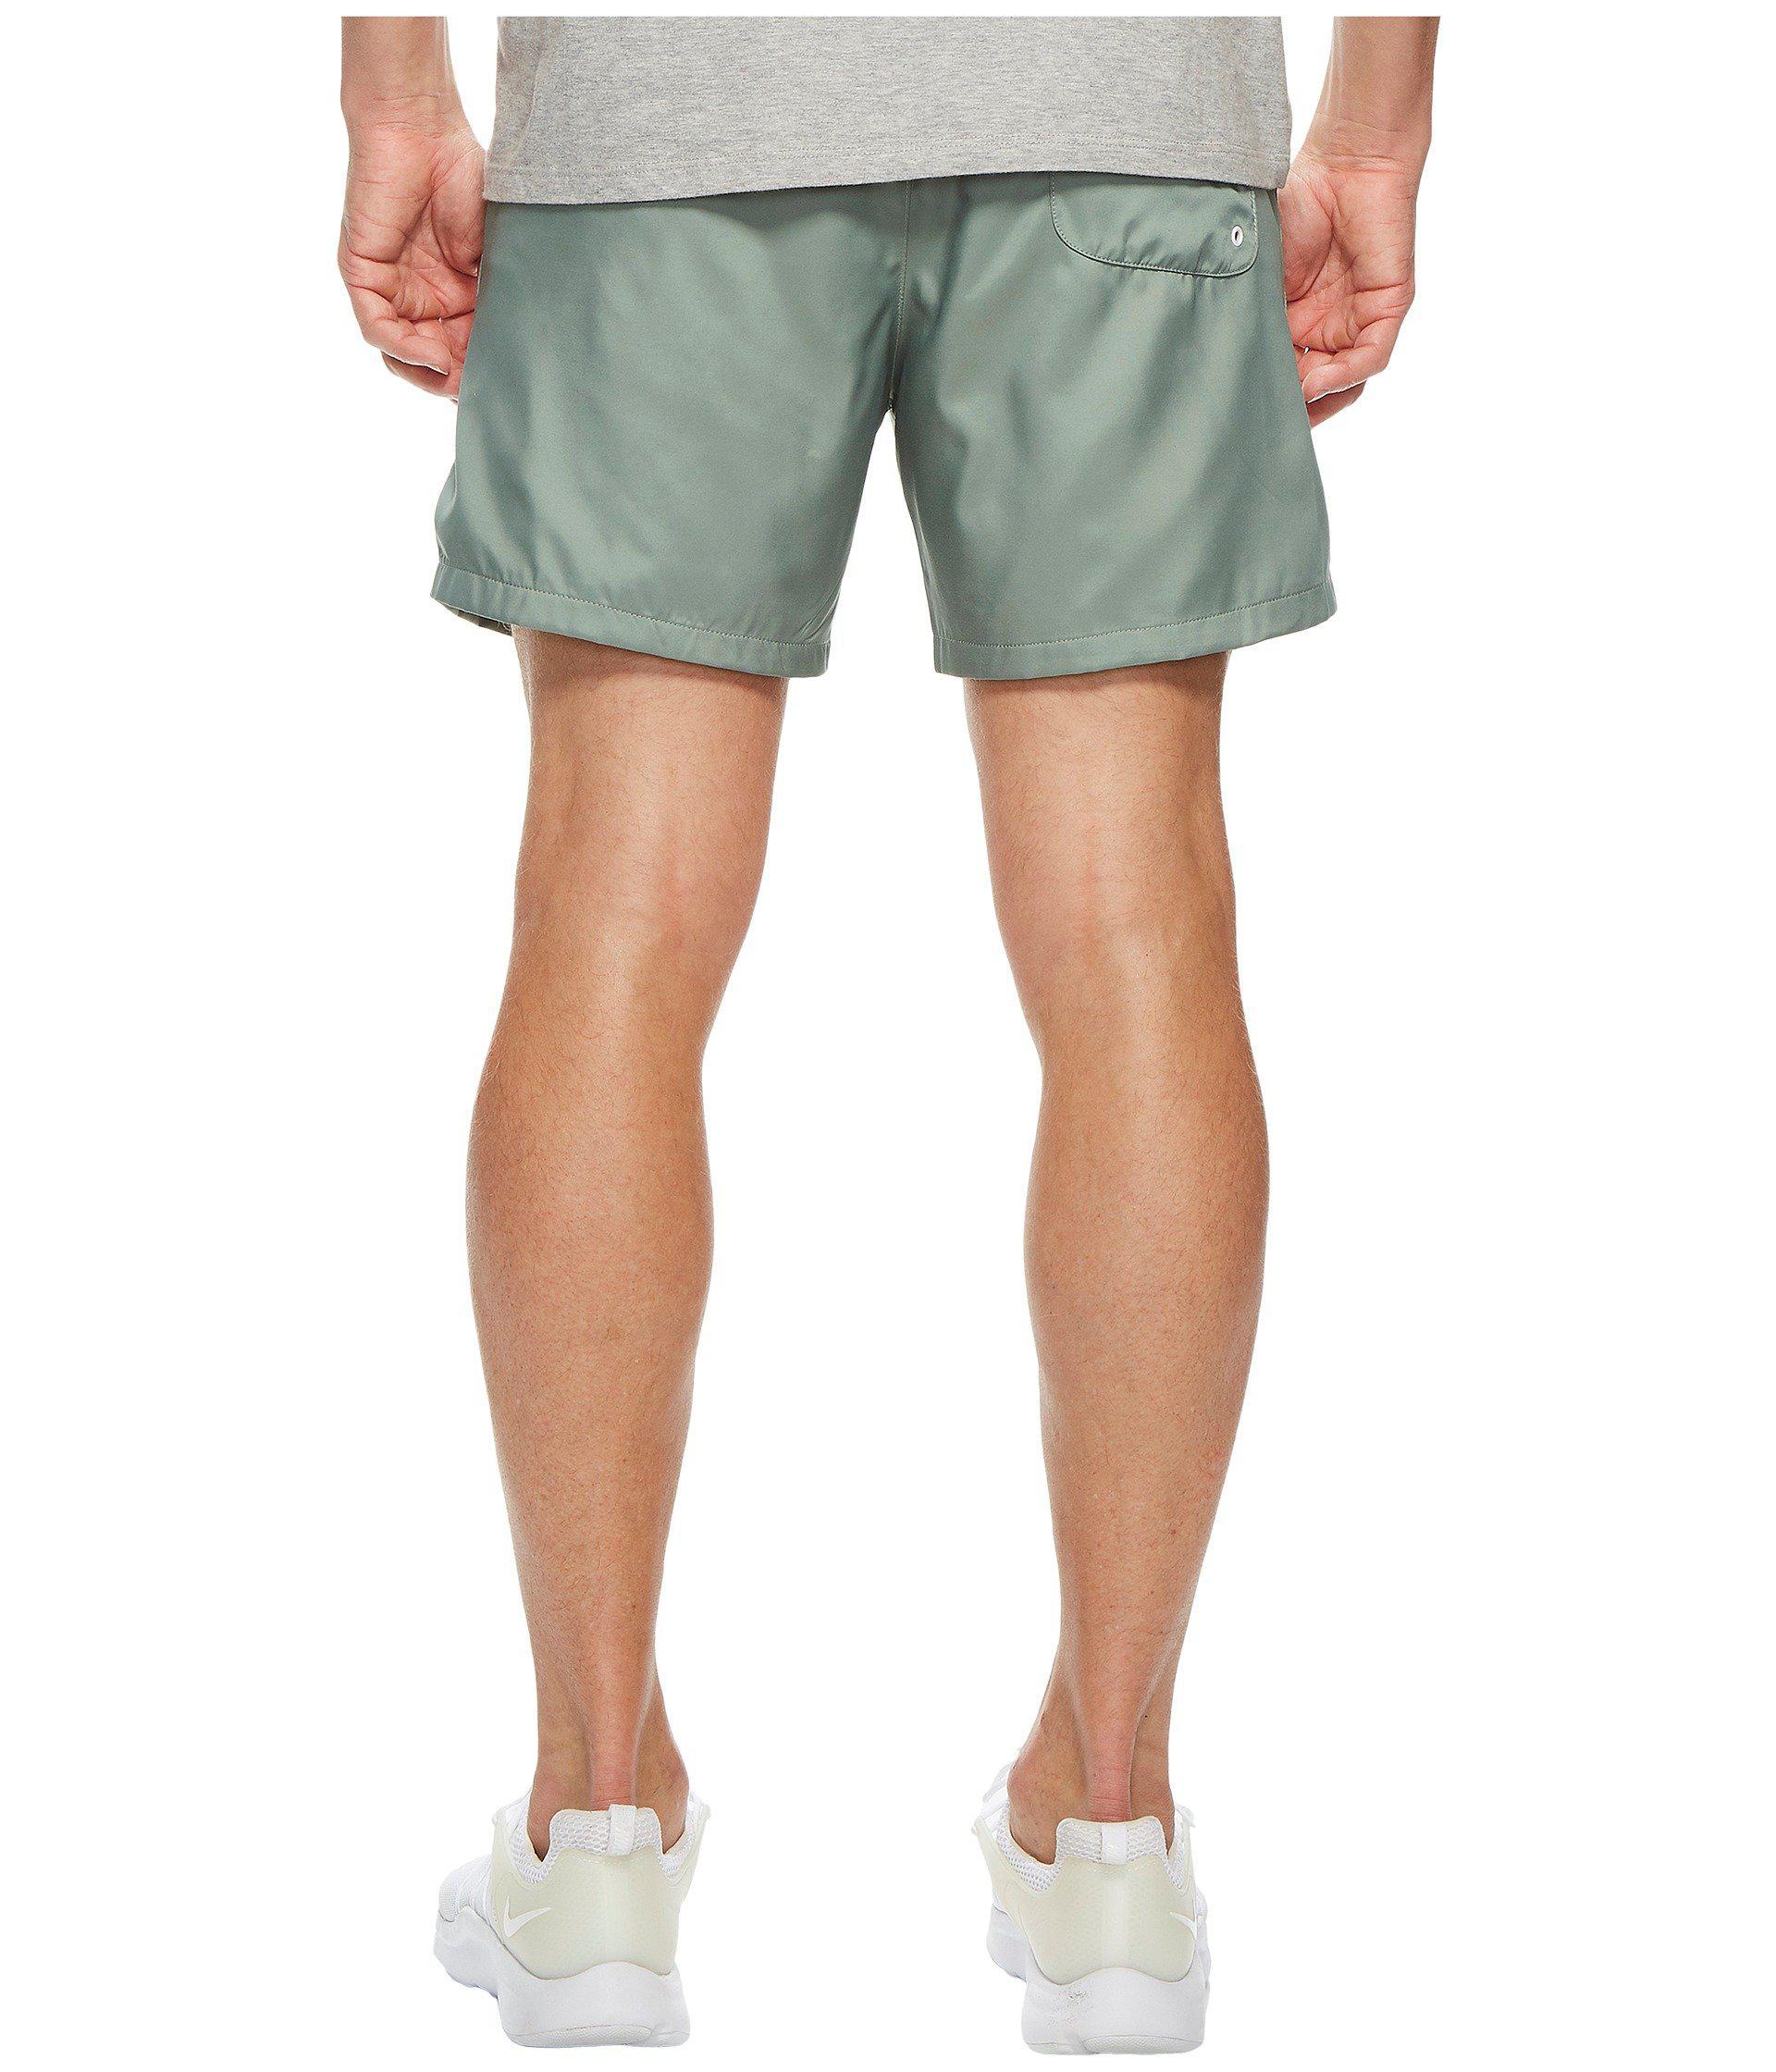 bf1784f1b7 Nike Woven Flow Short in Green for Men - Lyst